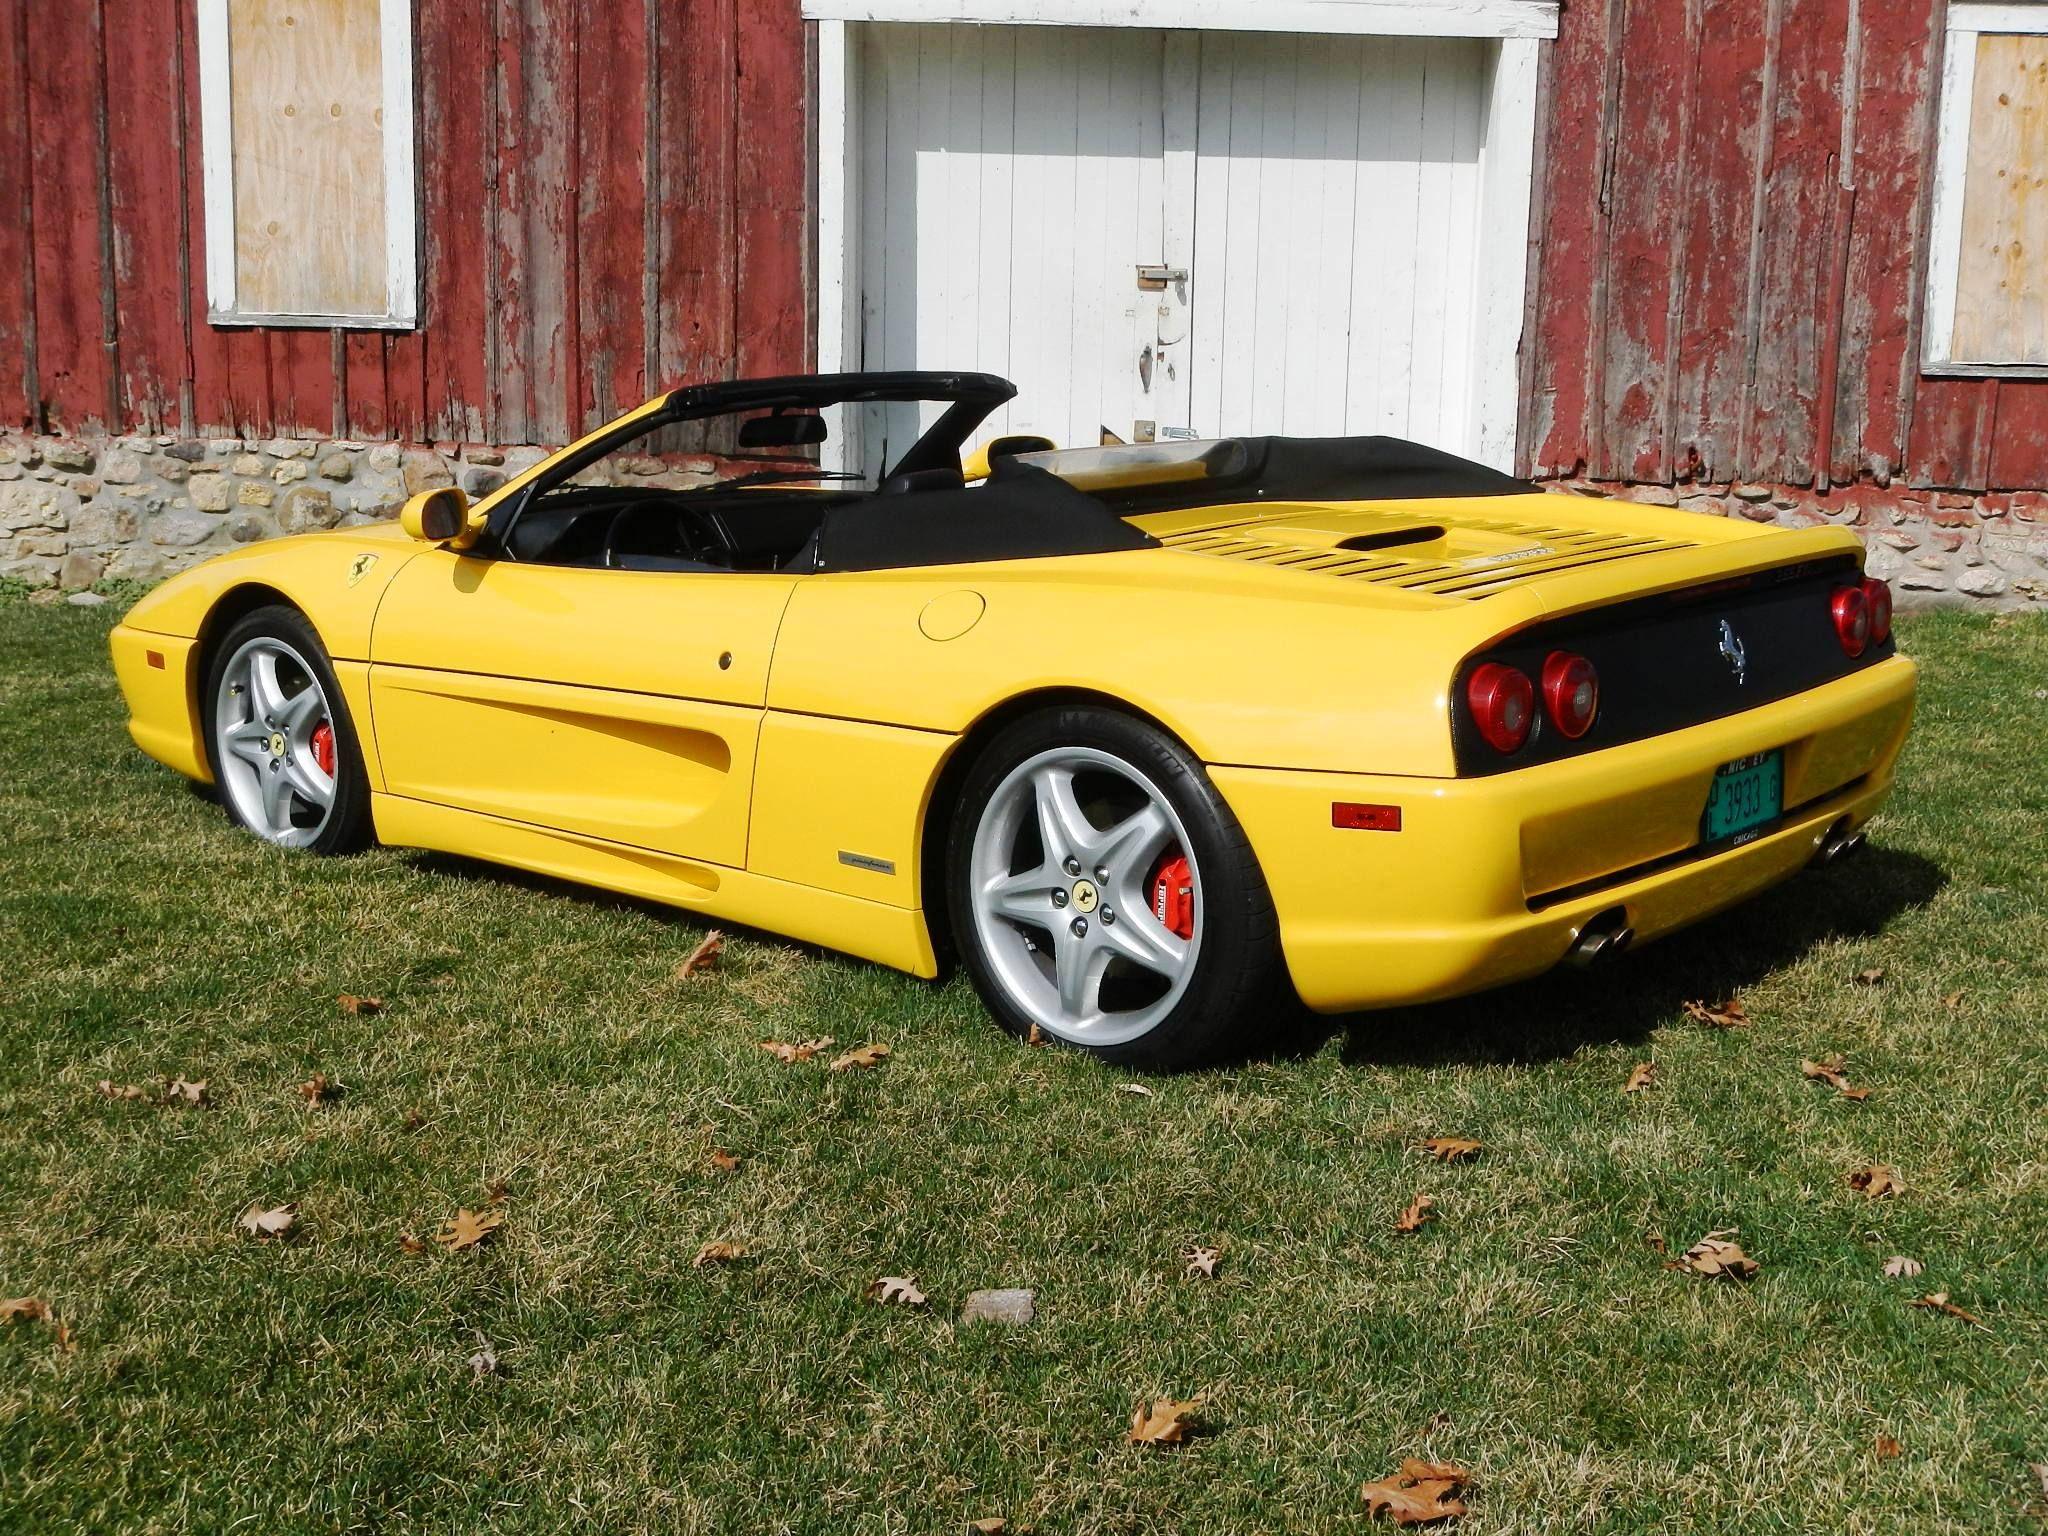 Ferrari 355 F1 Spider | Yes, please | Pinterest | Ferrari, F1 and Wheels